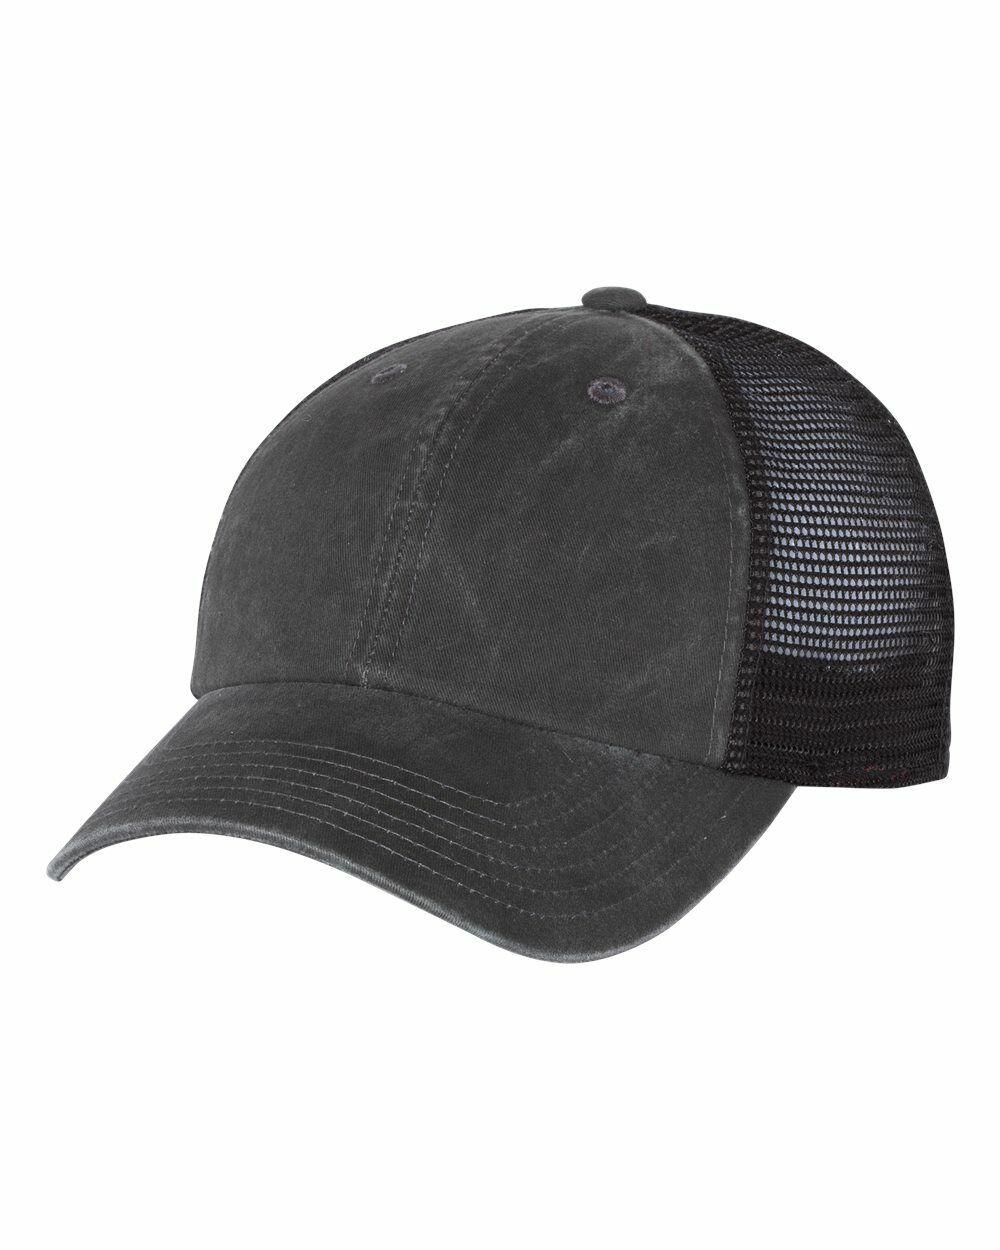 American Needle Raglan Bones Cap Mesh Back Dad Hat Curved Bi